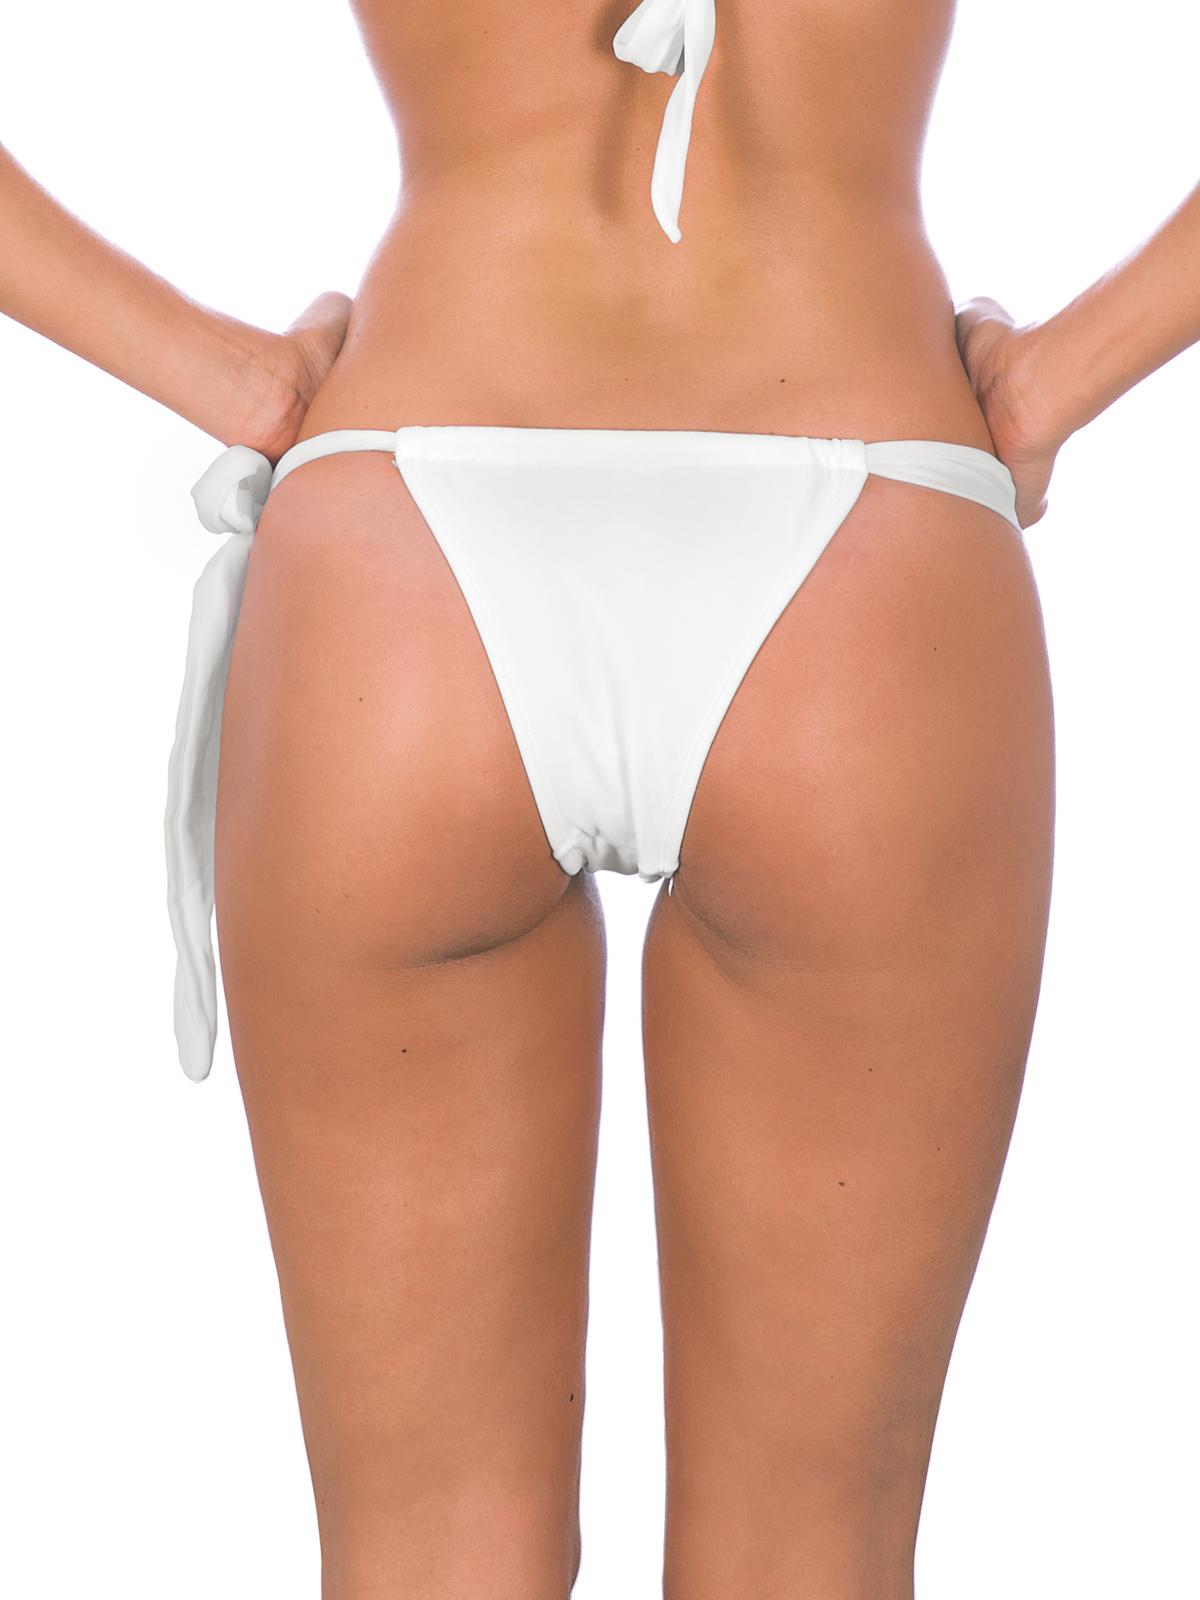 865fe41ba48 Bikini Bottoms White Sliding Tie-side Bikini Bottom - Branco Lace